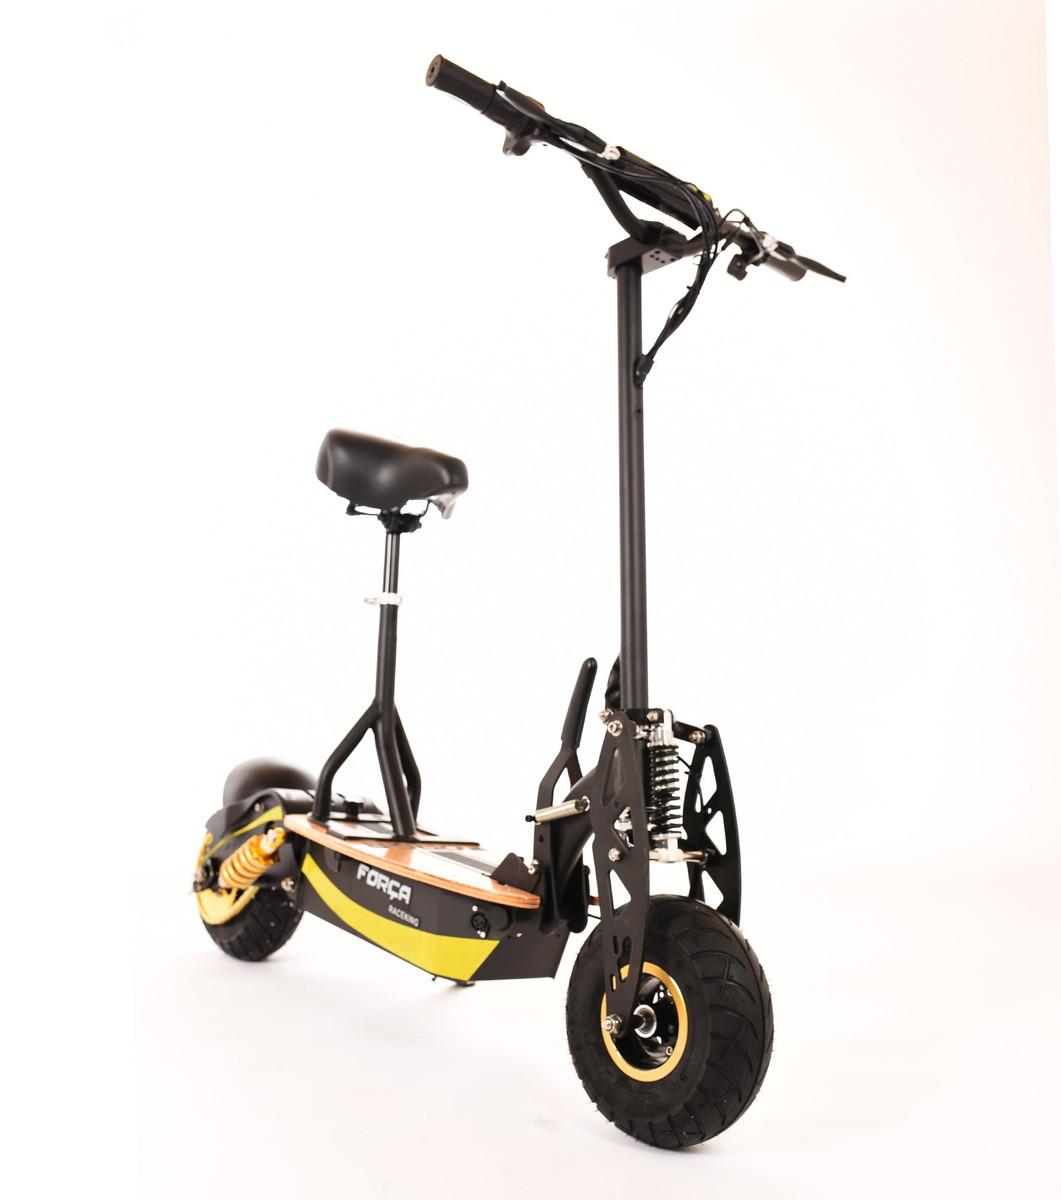 FORÇA Raceking II 35 km/h Scooter Black-Gold Edition